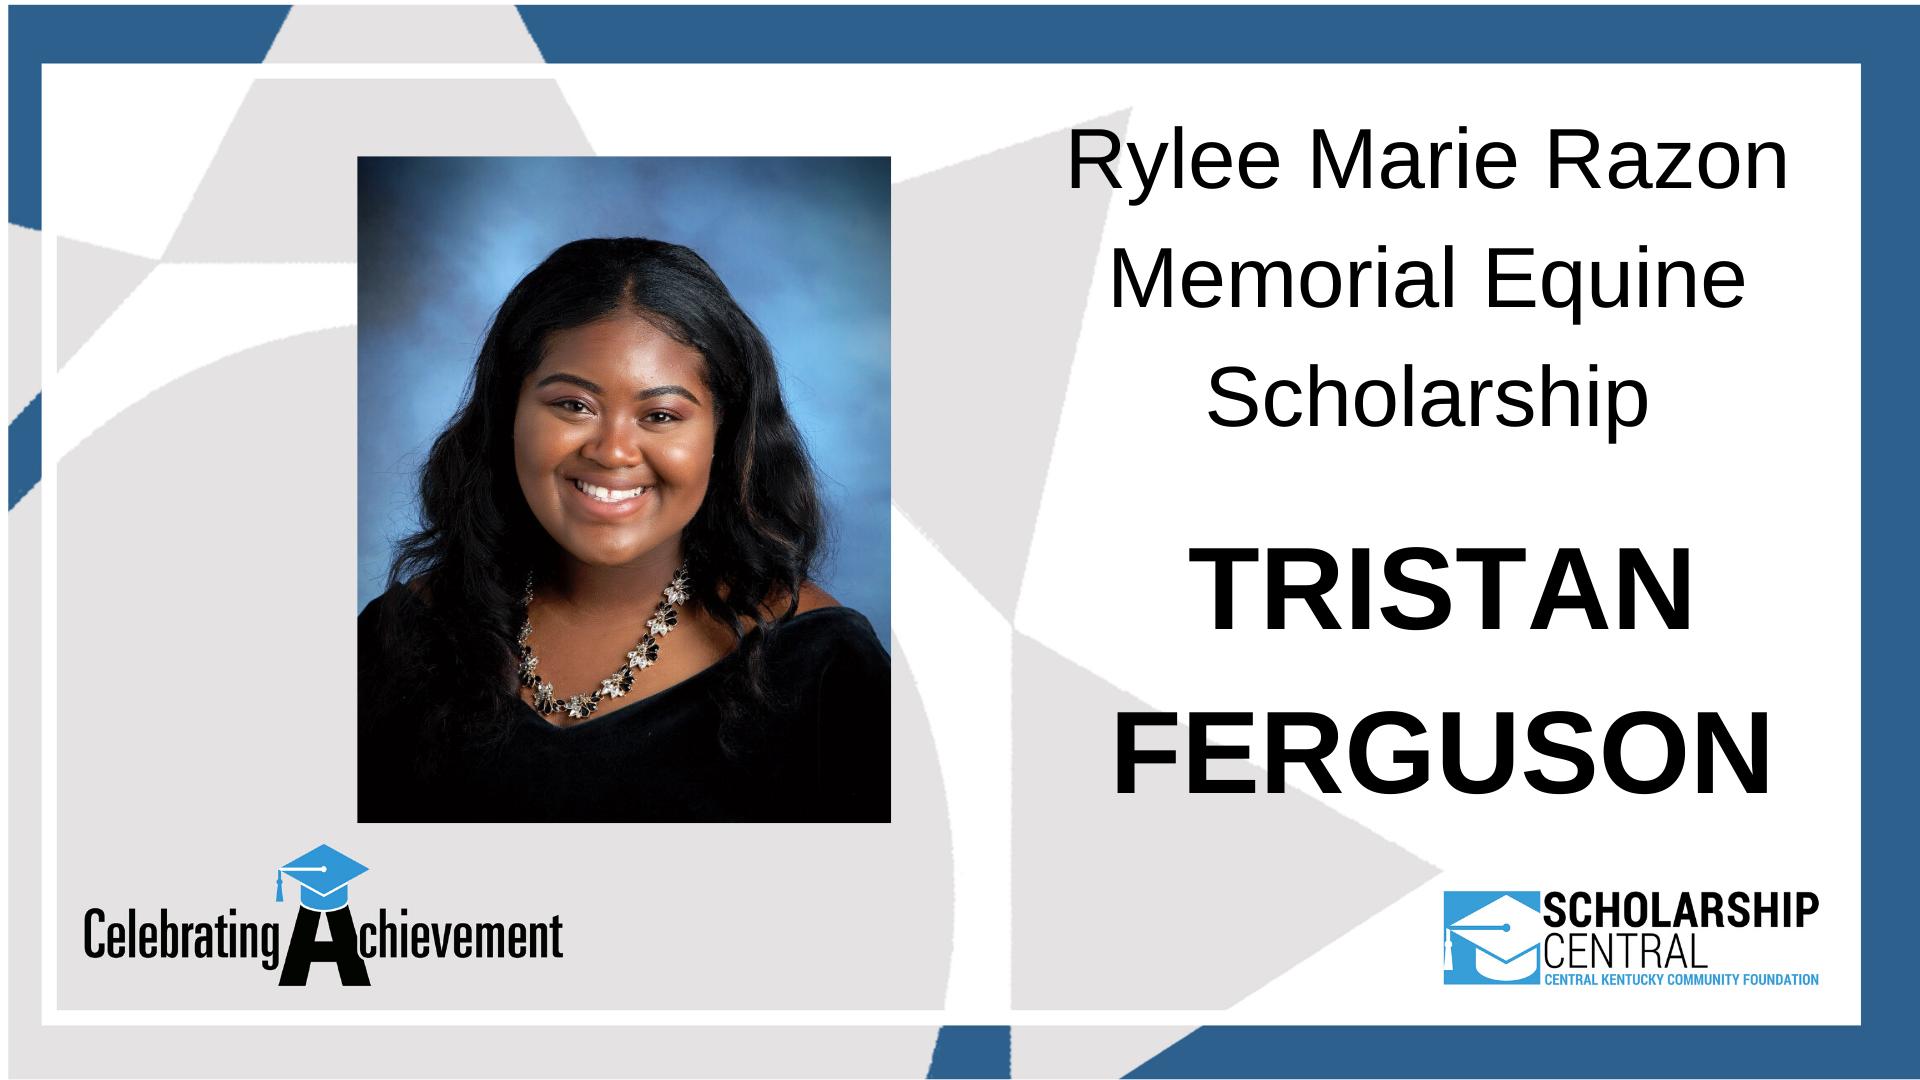 Rylee Marie Razon Scholarship